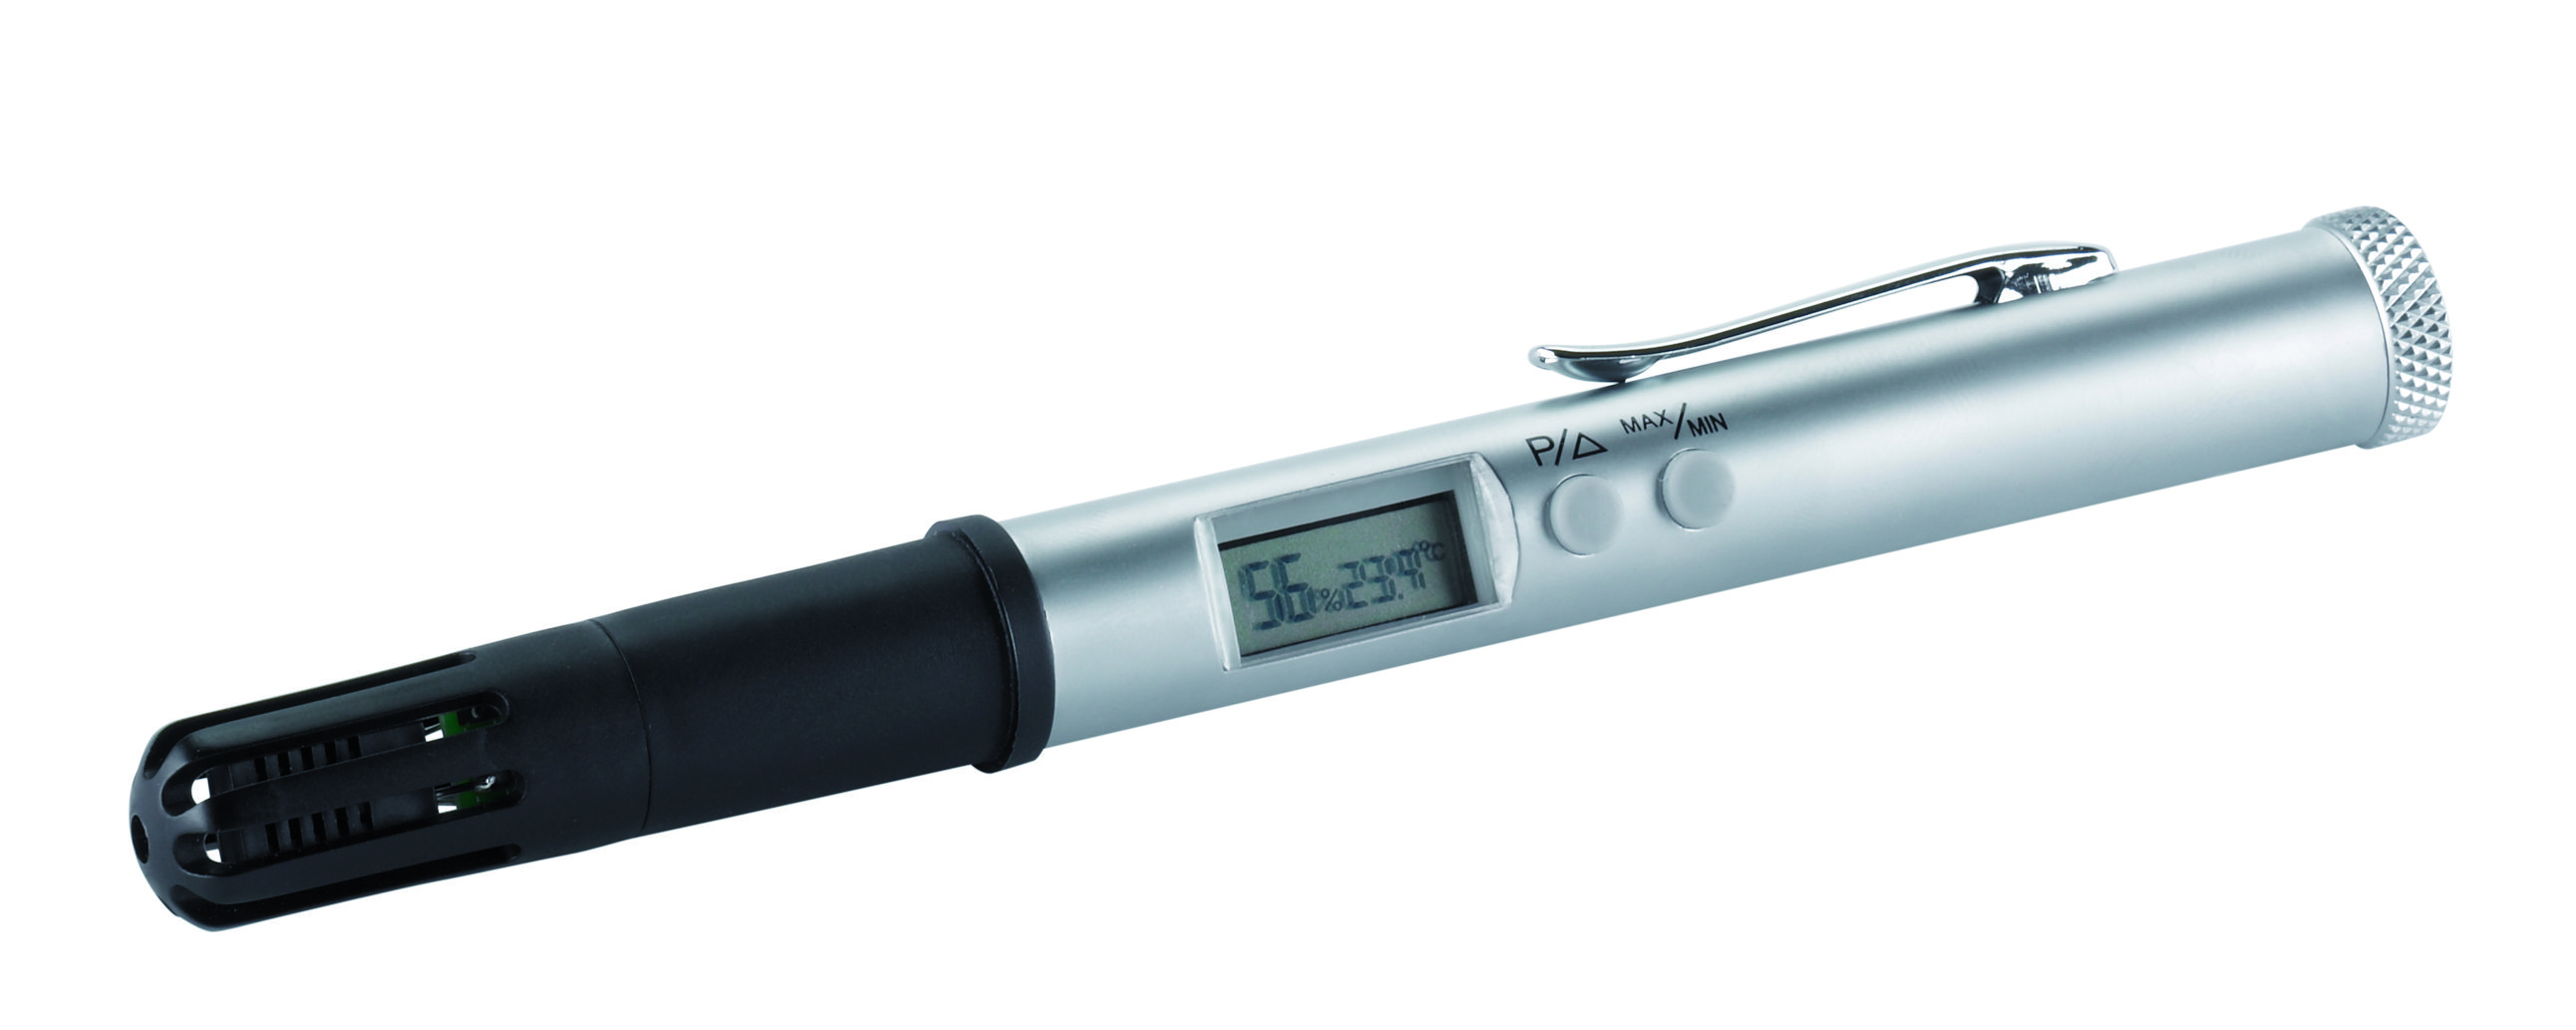 Holmenkol digitalt Thermometer - Hygrometer